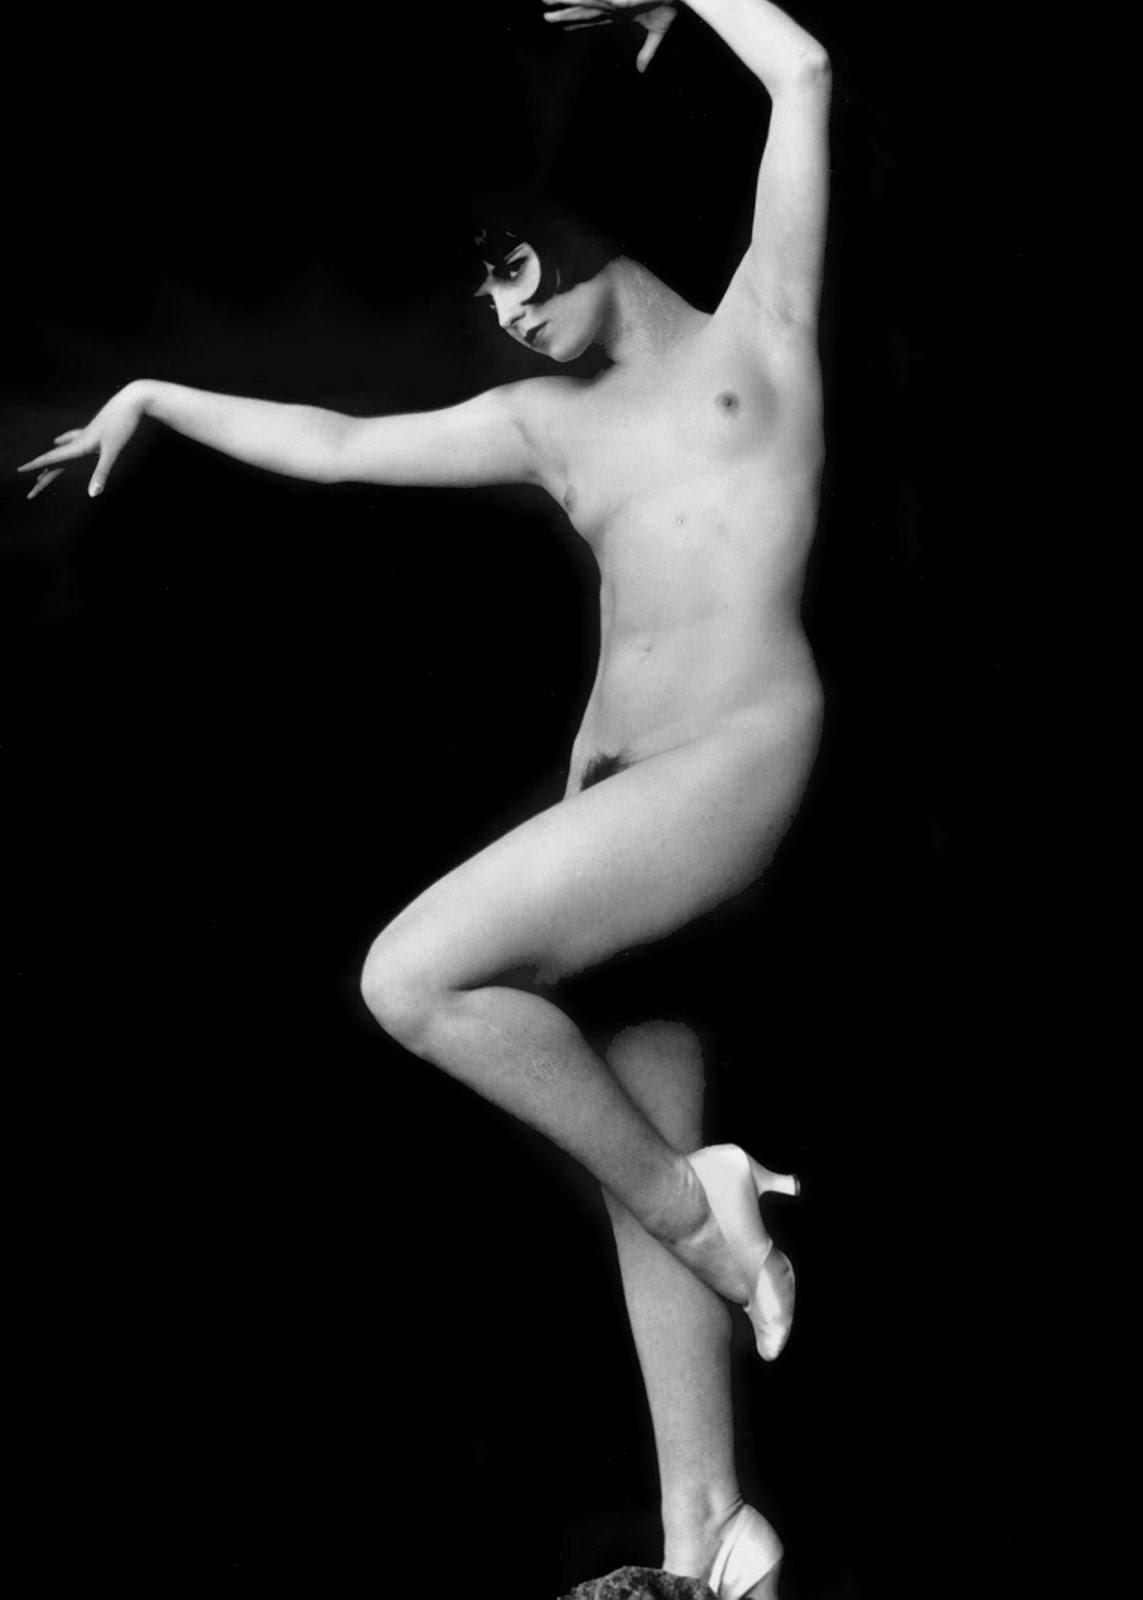 http://4.bp.blogspot.com/-YWys6LP-0rk/T6_nDx6dVJI/AAAAAAAALeA/6c_HnG-fgPo/s1600/Louise+brooks+dance.jpg